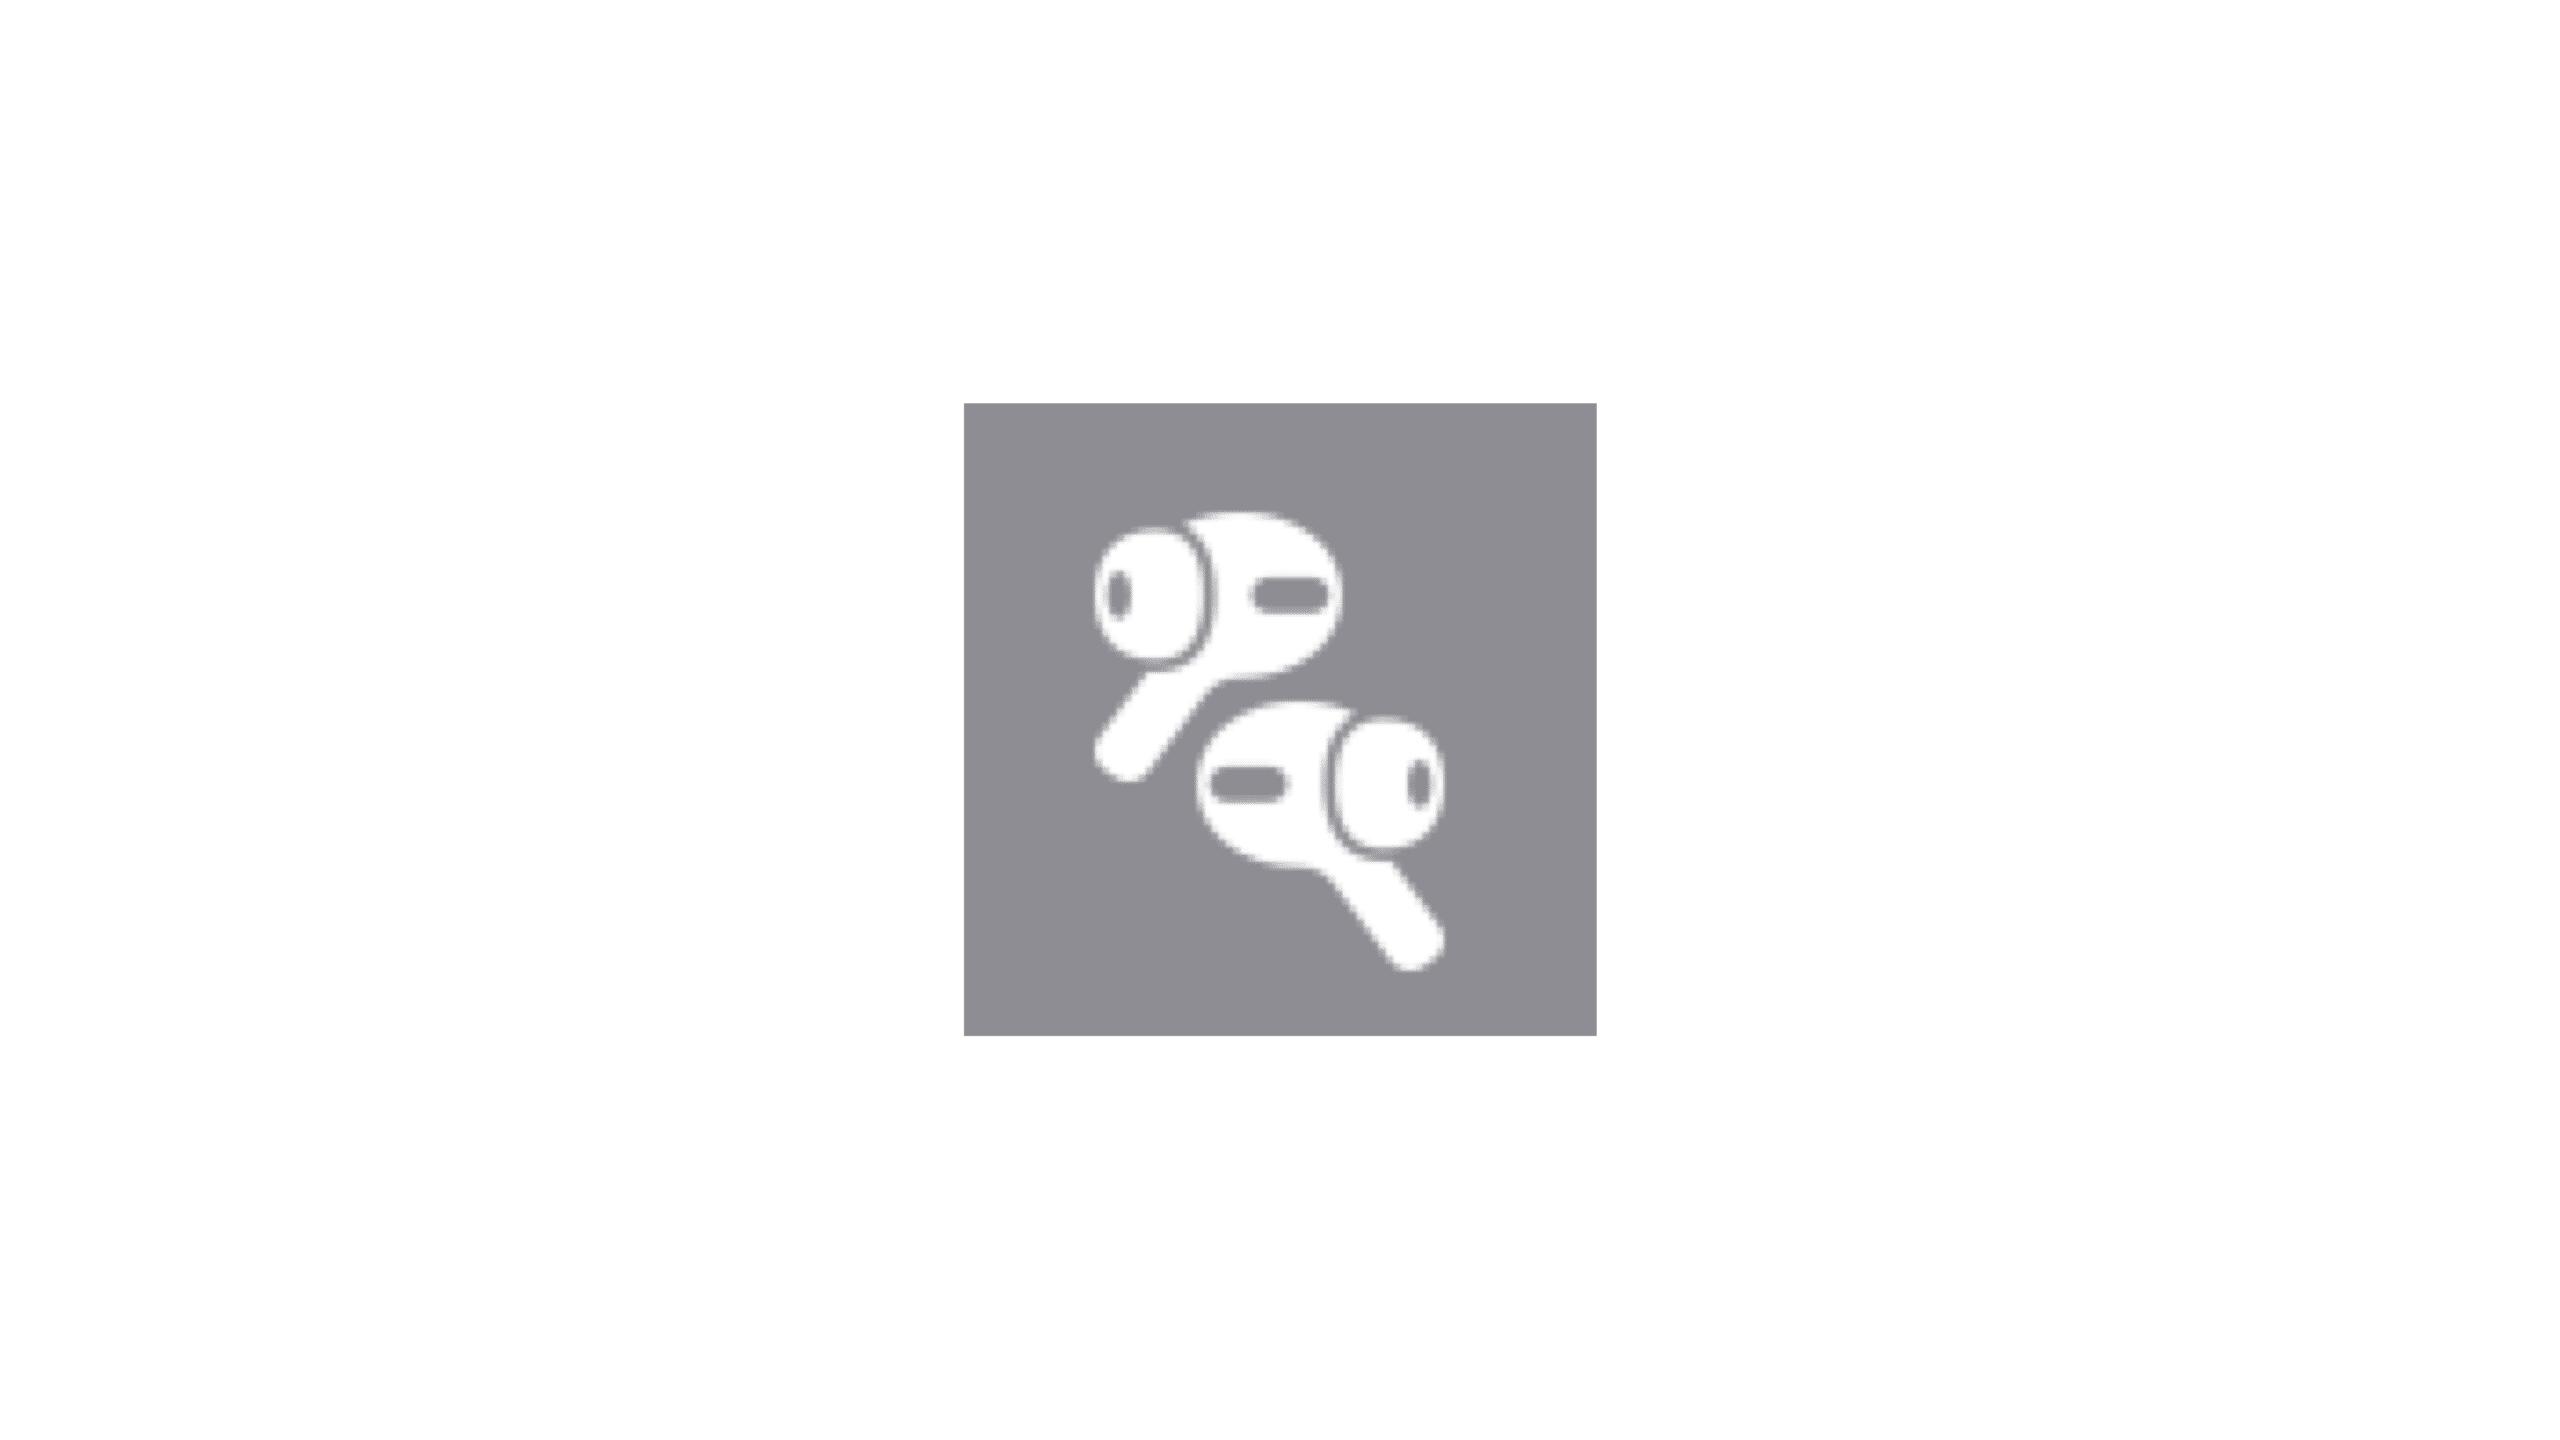 AirPods-Leak aus iOS 13.2-Beta - 9to5Mac